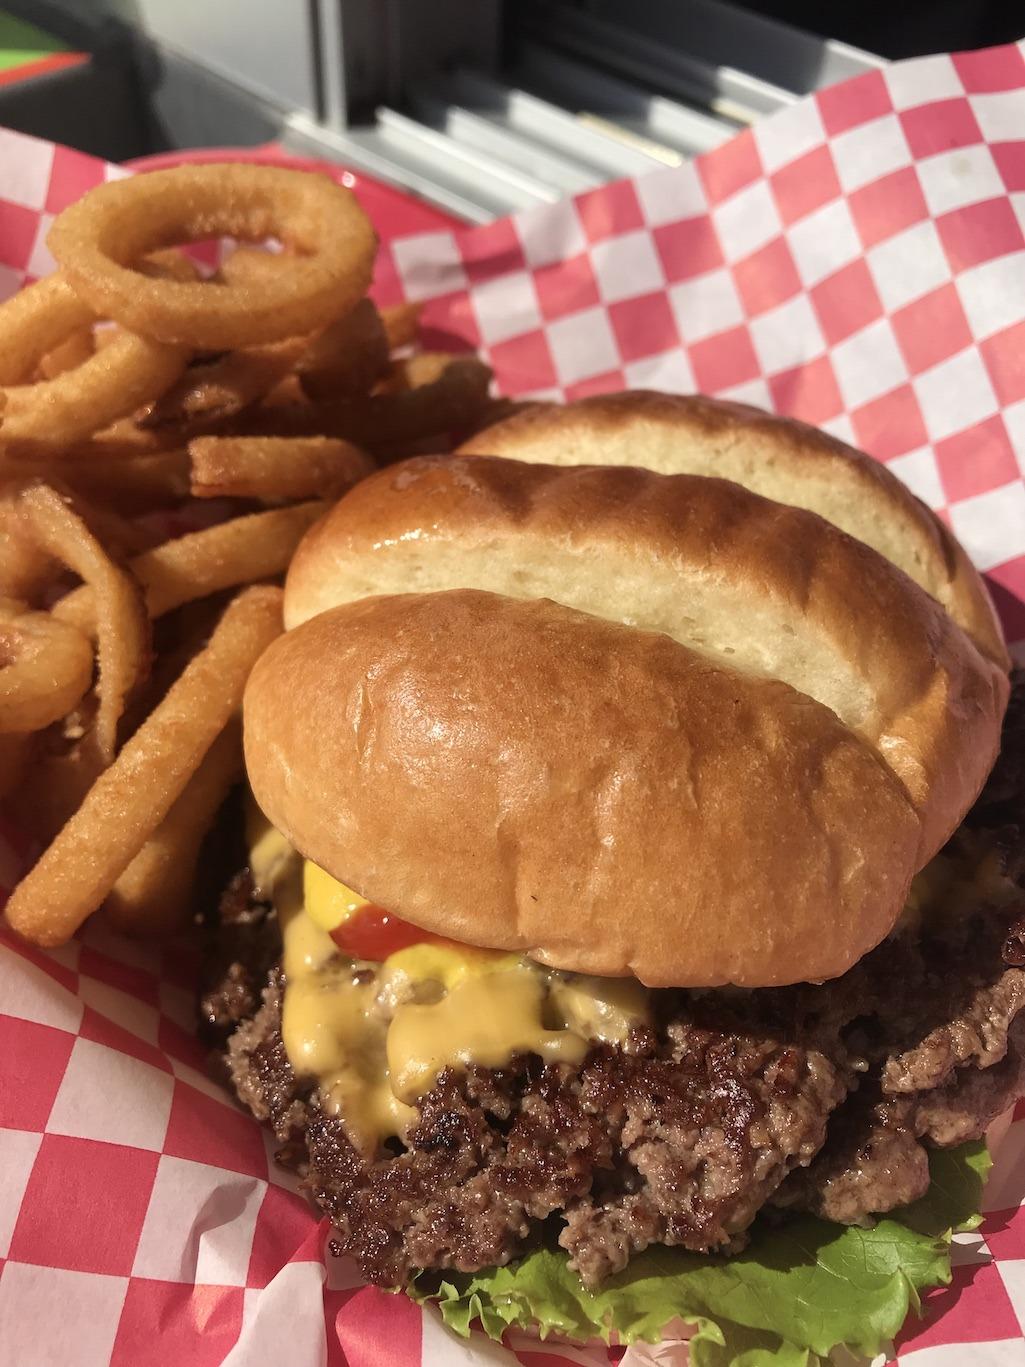 Michaels Burger and Custard Madison